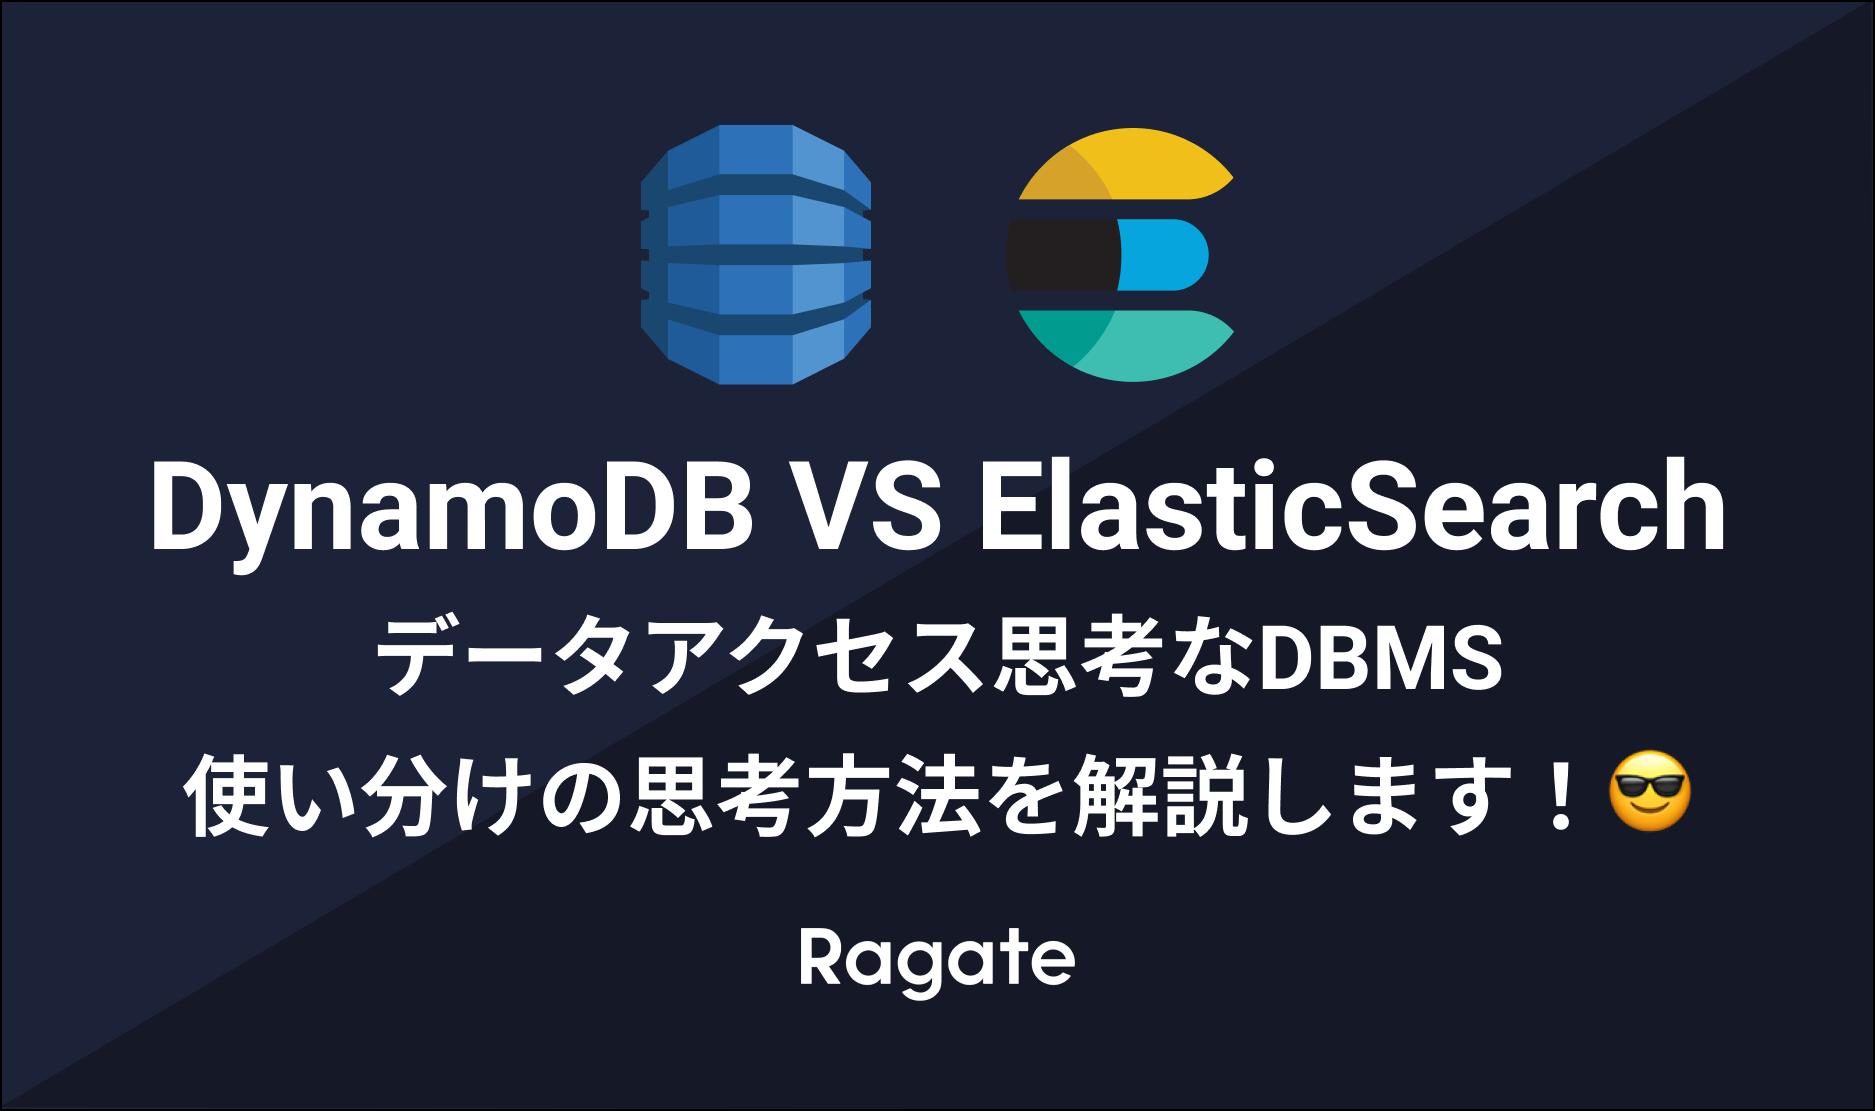 DynamoDB VS ElasticSearch!🤔データアクセス思考なDBMS使い分けの思考方法を解説します!😎